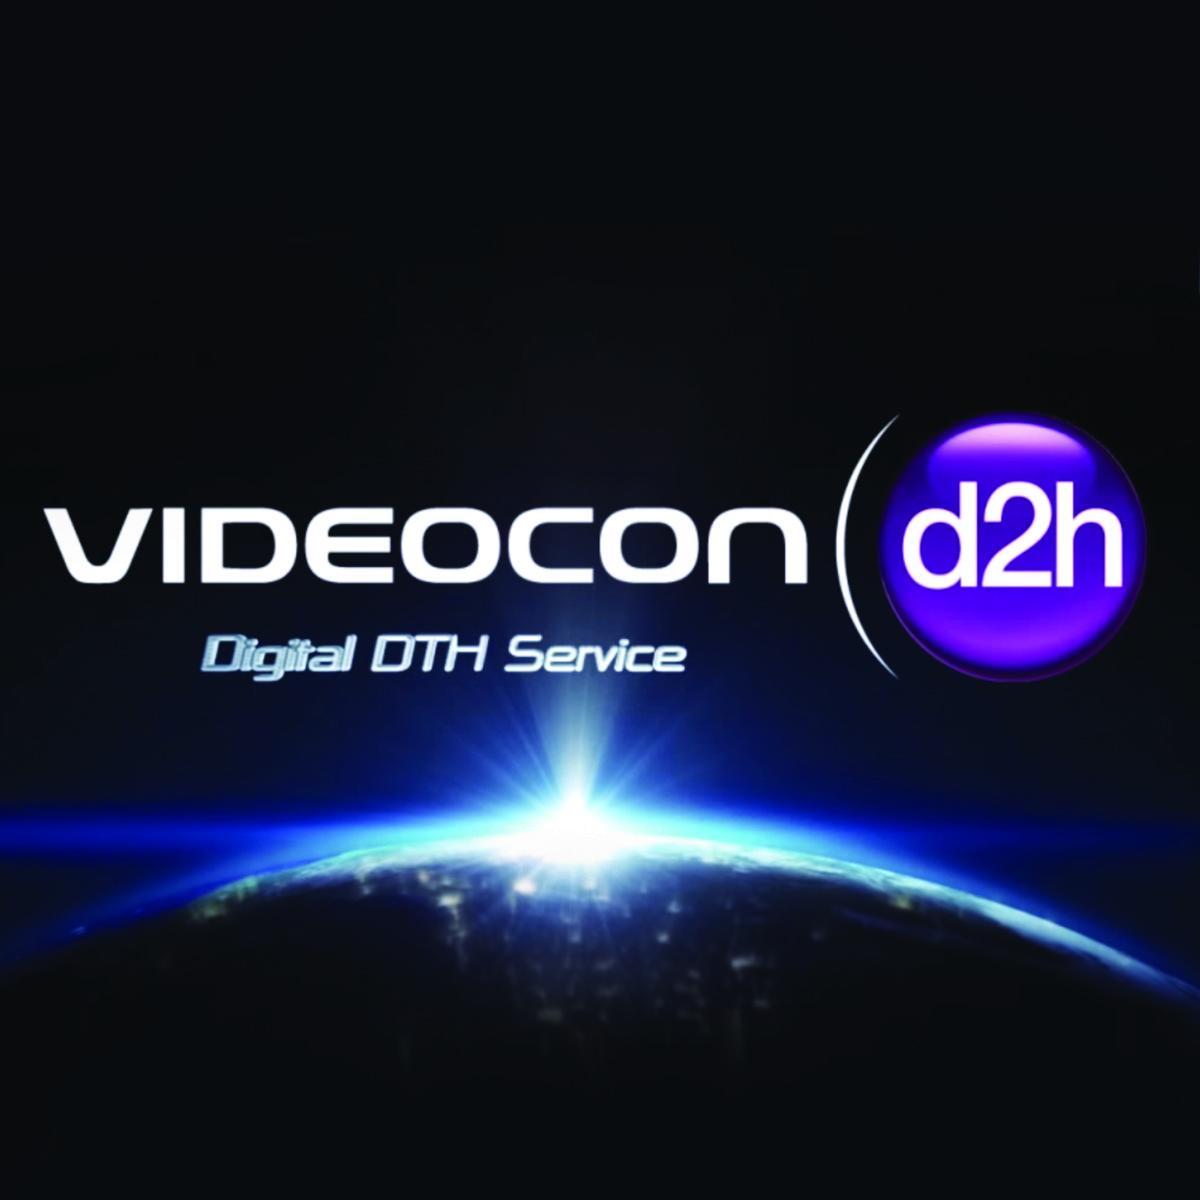 http://www.indiantelevision.com/sites/default/files/styles/smartcrop_800x800/public/images/tv-images/2016/06/30/videocon%20d2h.jpg?itok=3lugJcgy